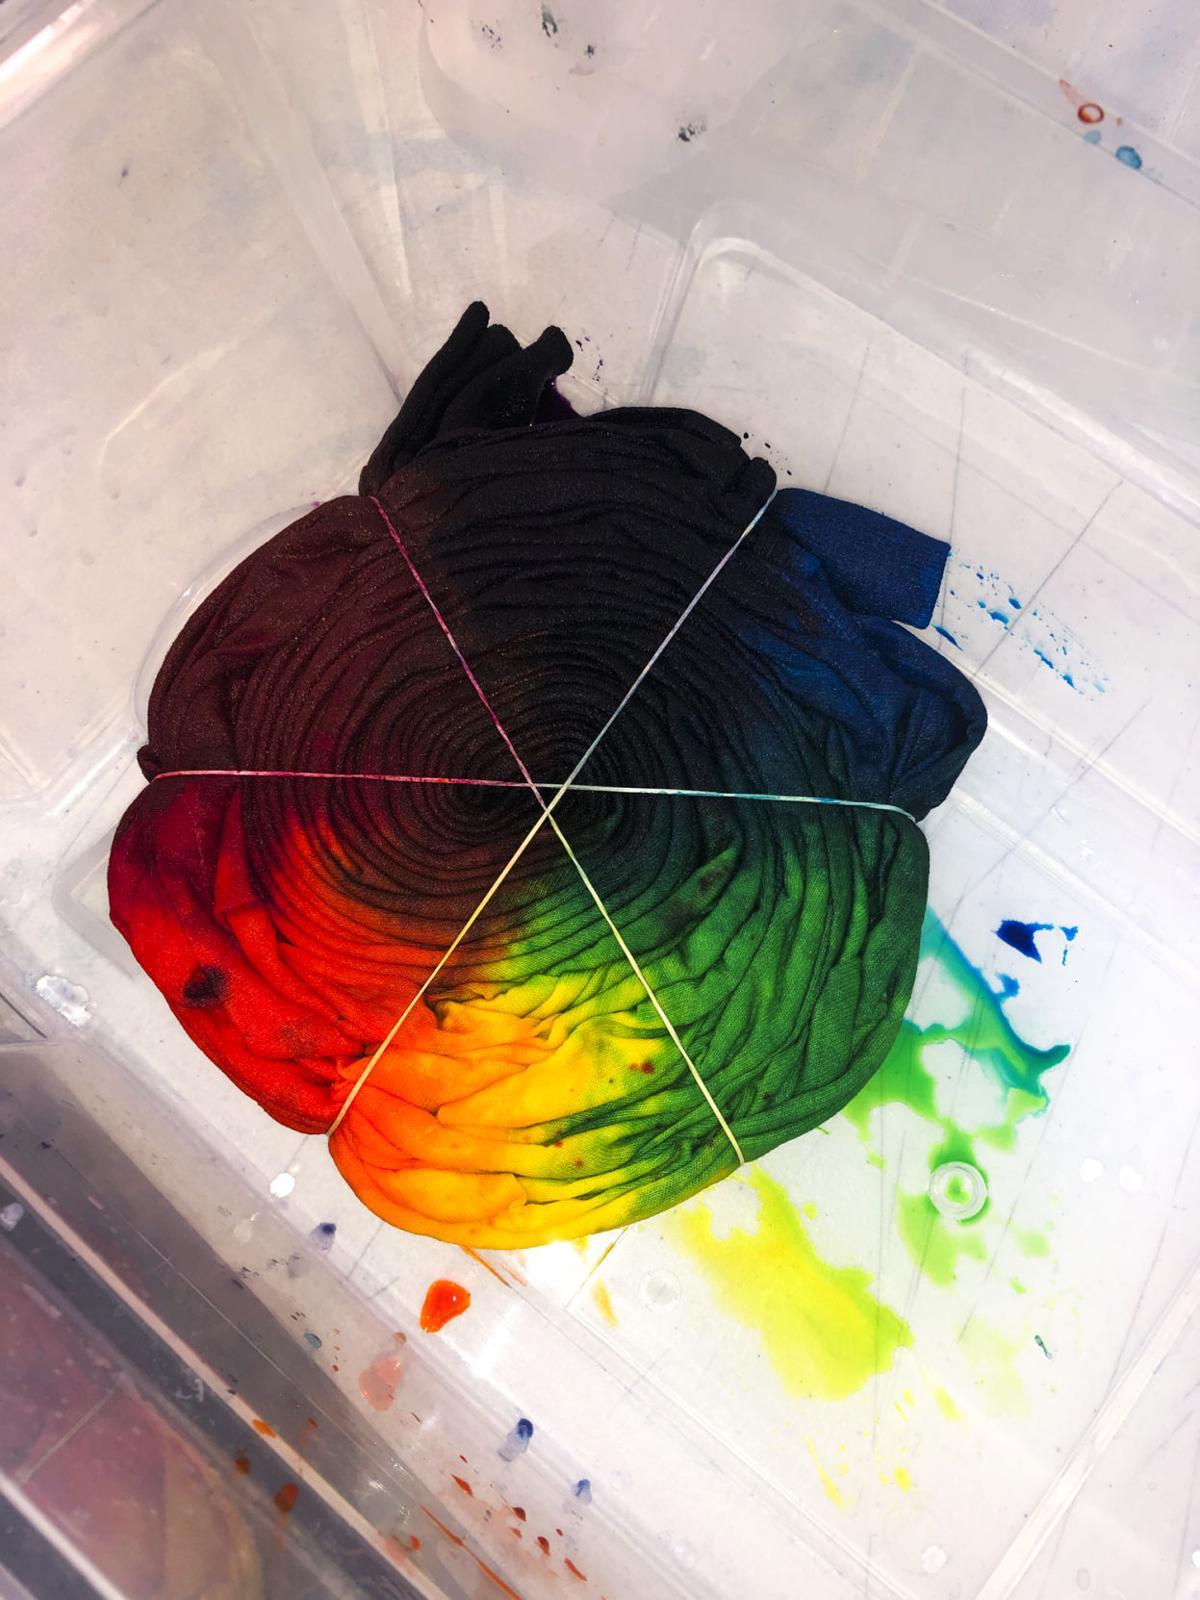 Flagstaff's resident tie-dyer